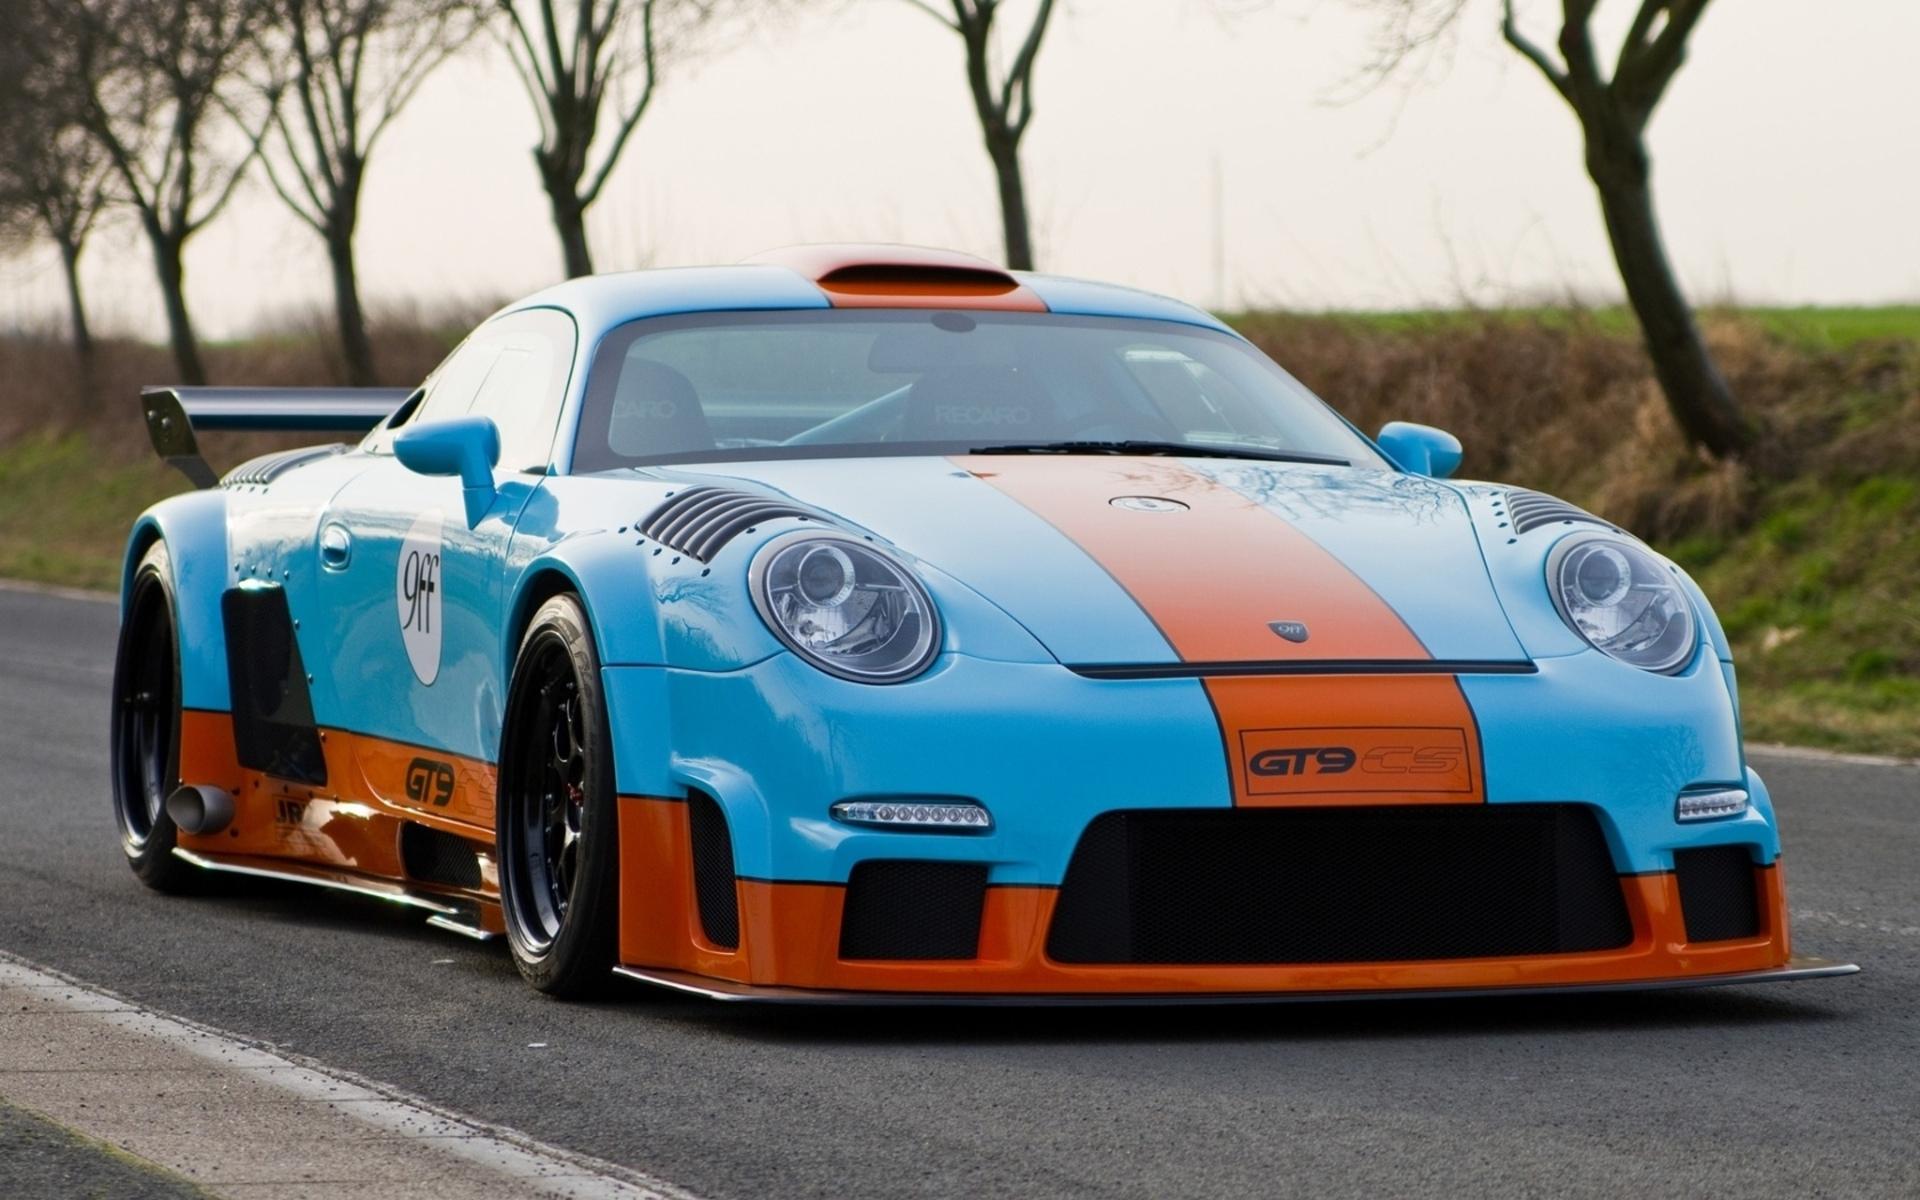 9ff GT9-CS Porsche 911 997 turbo racecar race racing color stripe ...